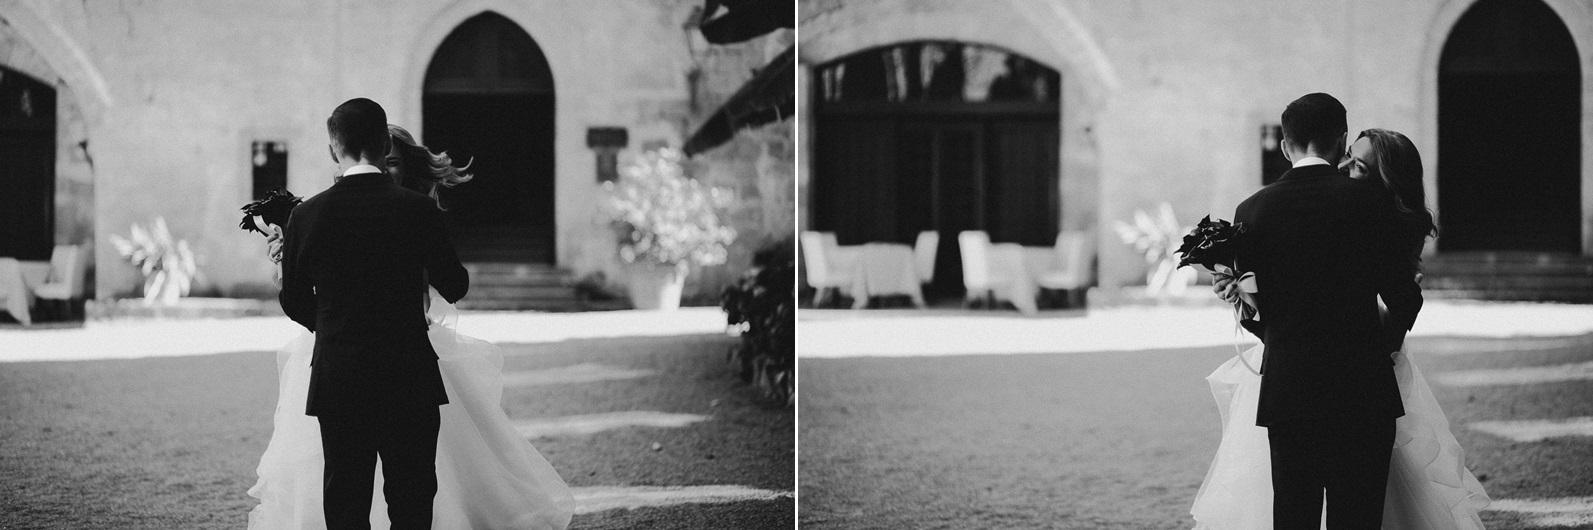 stylish-elopement-photographer-italy (49).jpg